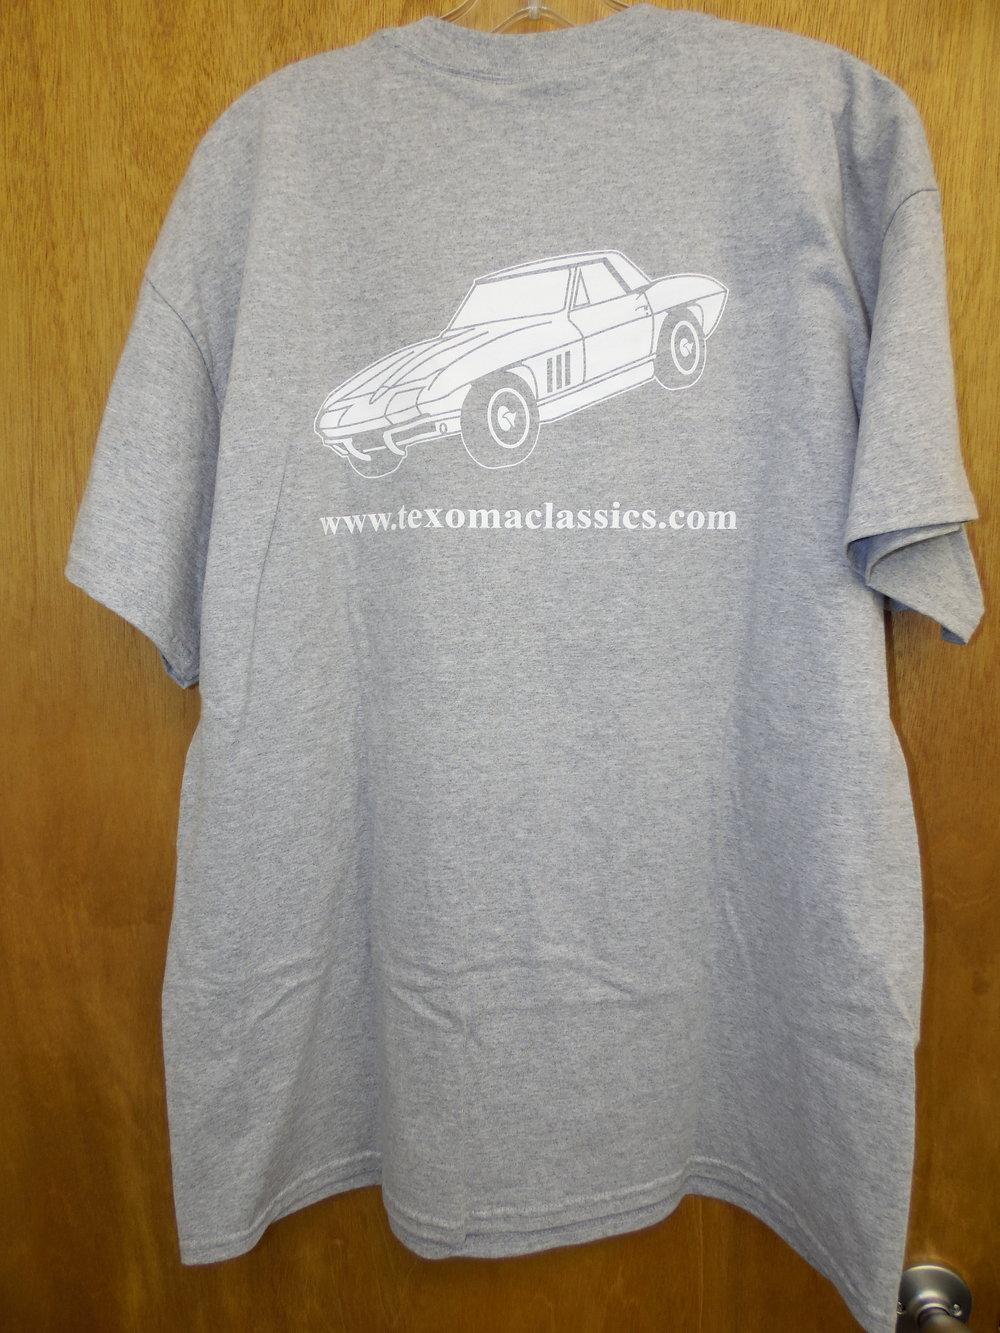 Texoma Classics T-Shirt